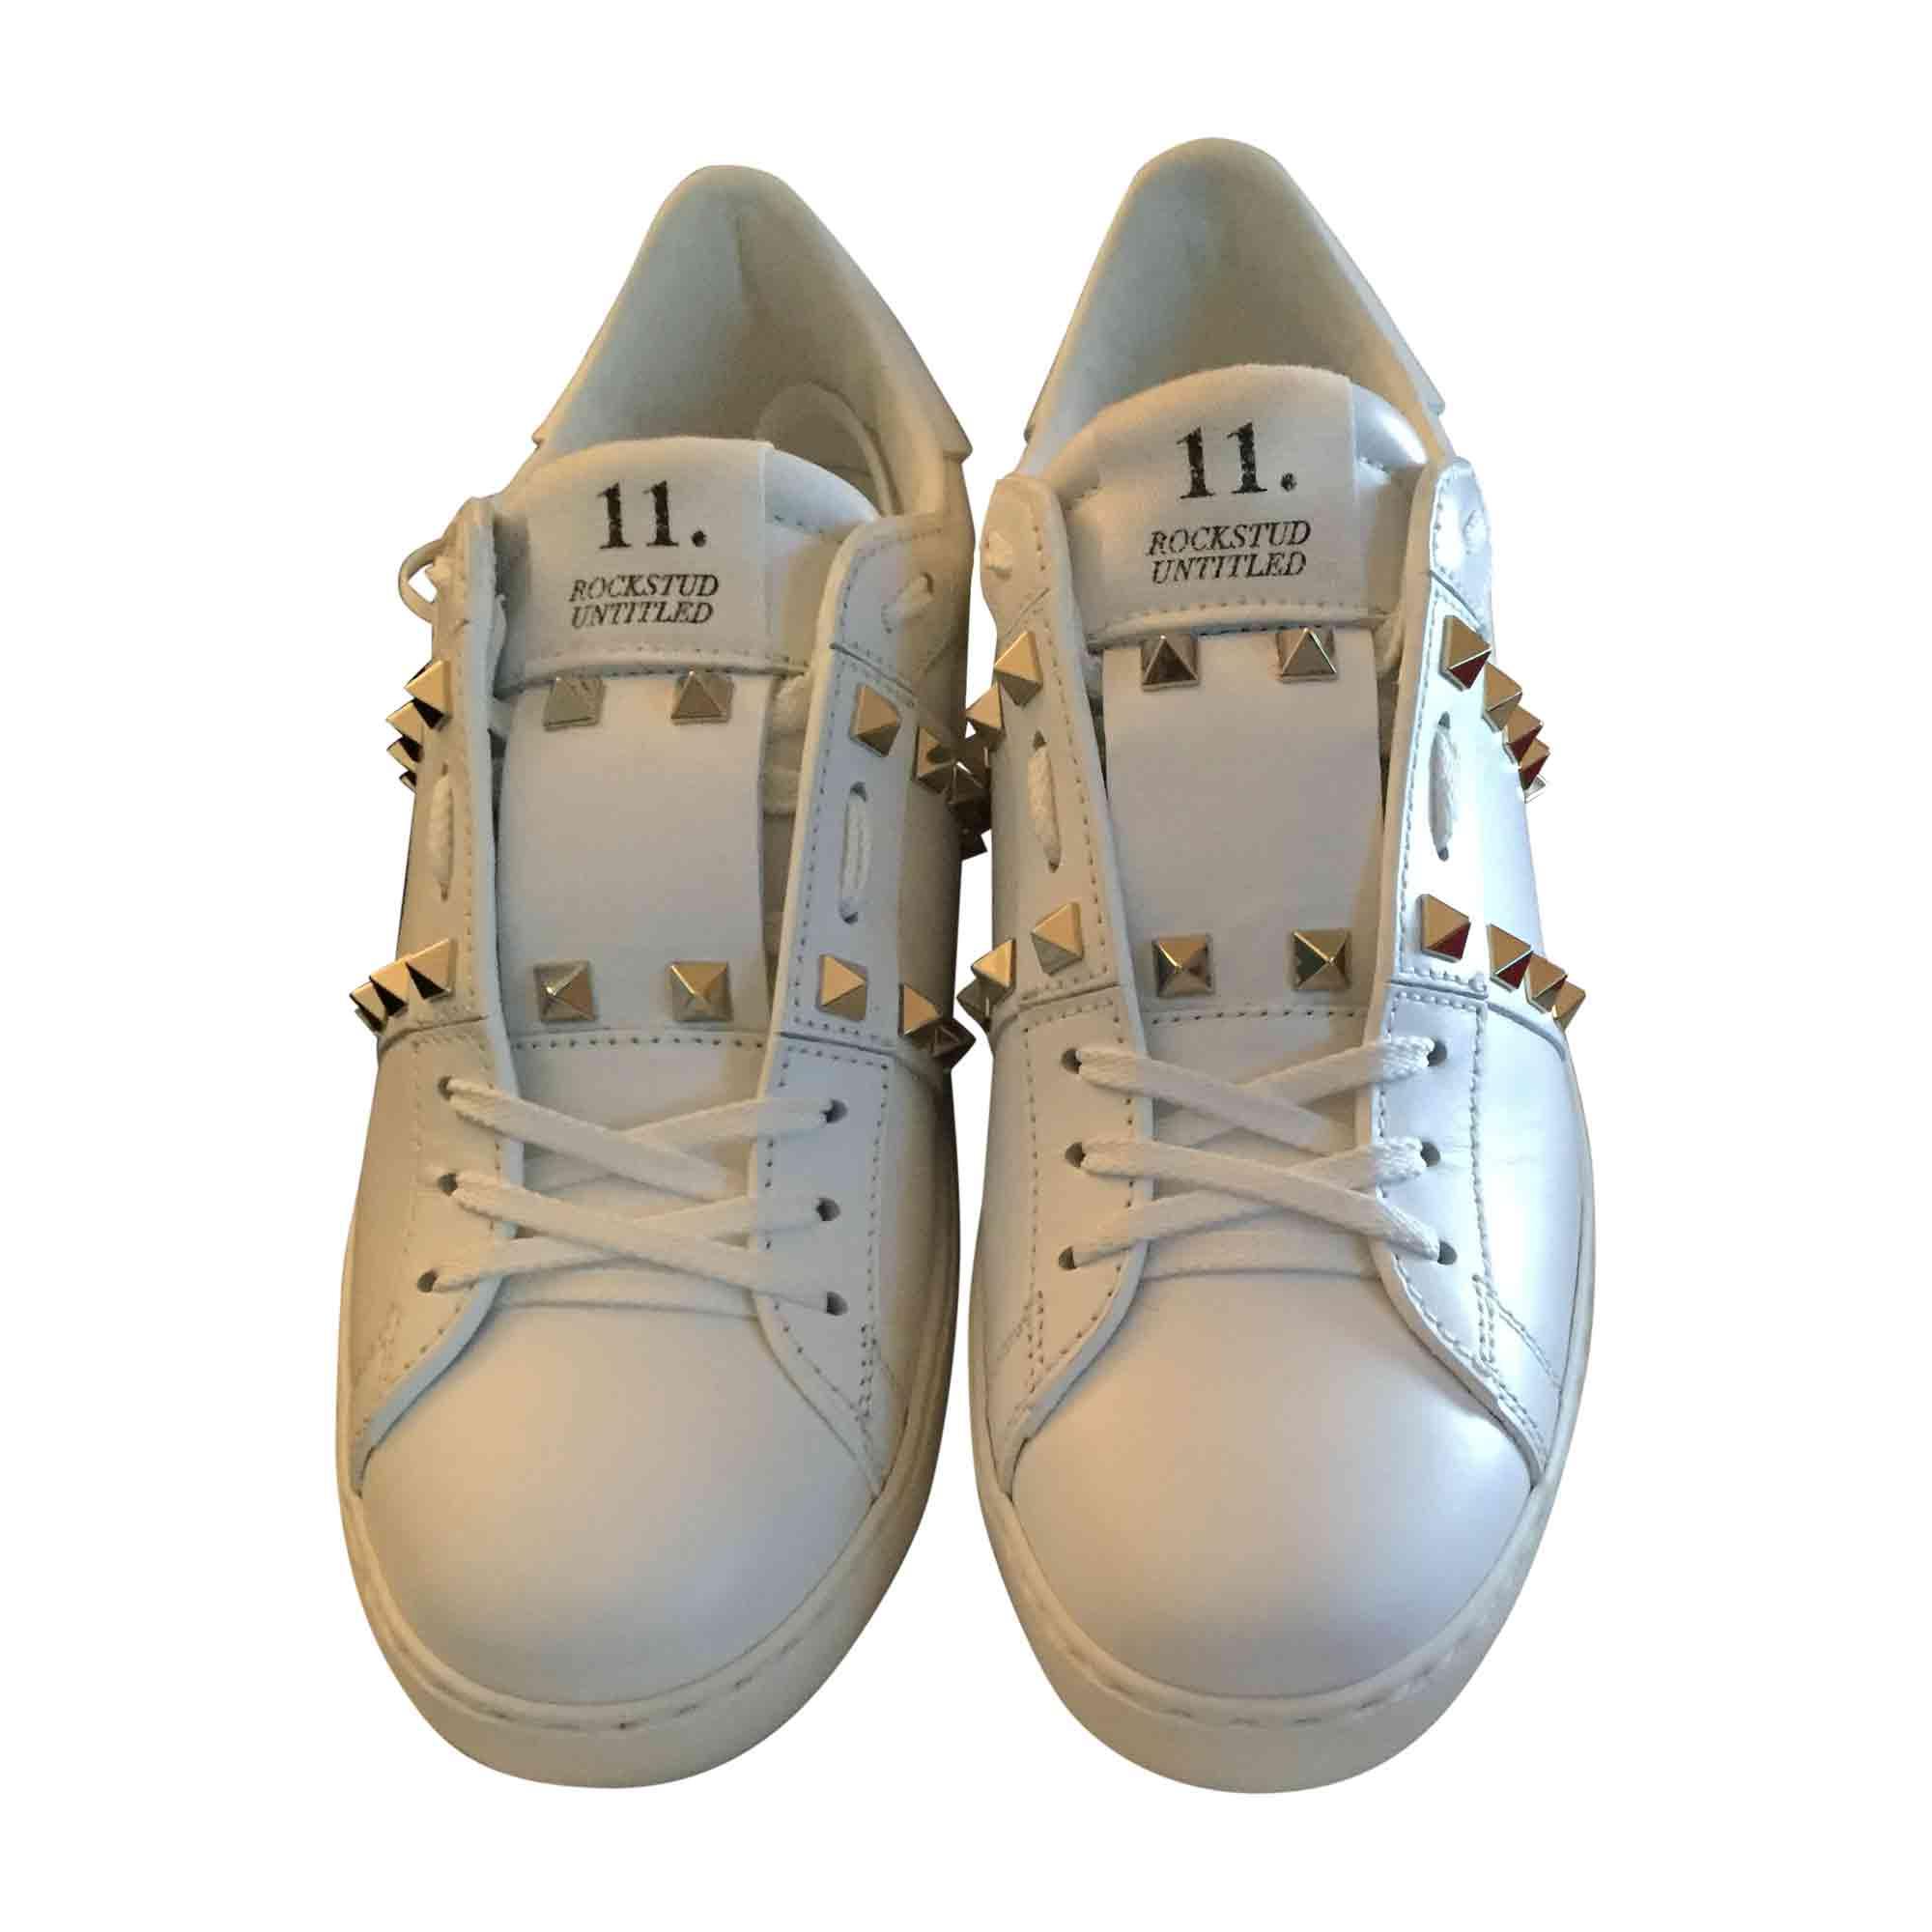 Blanc Valentino 126184197 37 Rockstud Vendu Geraldine Baskets Par 5 dI8wgxv7q